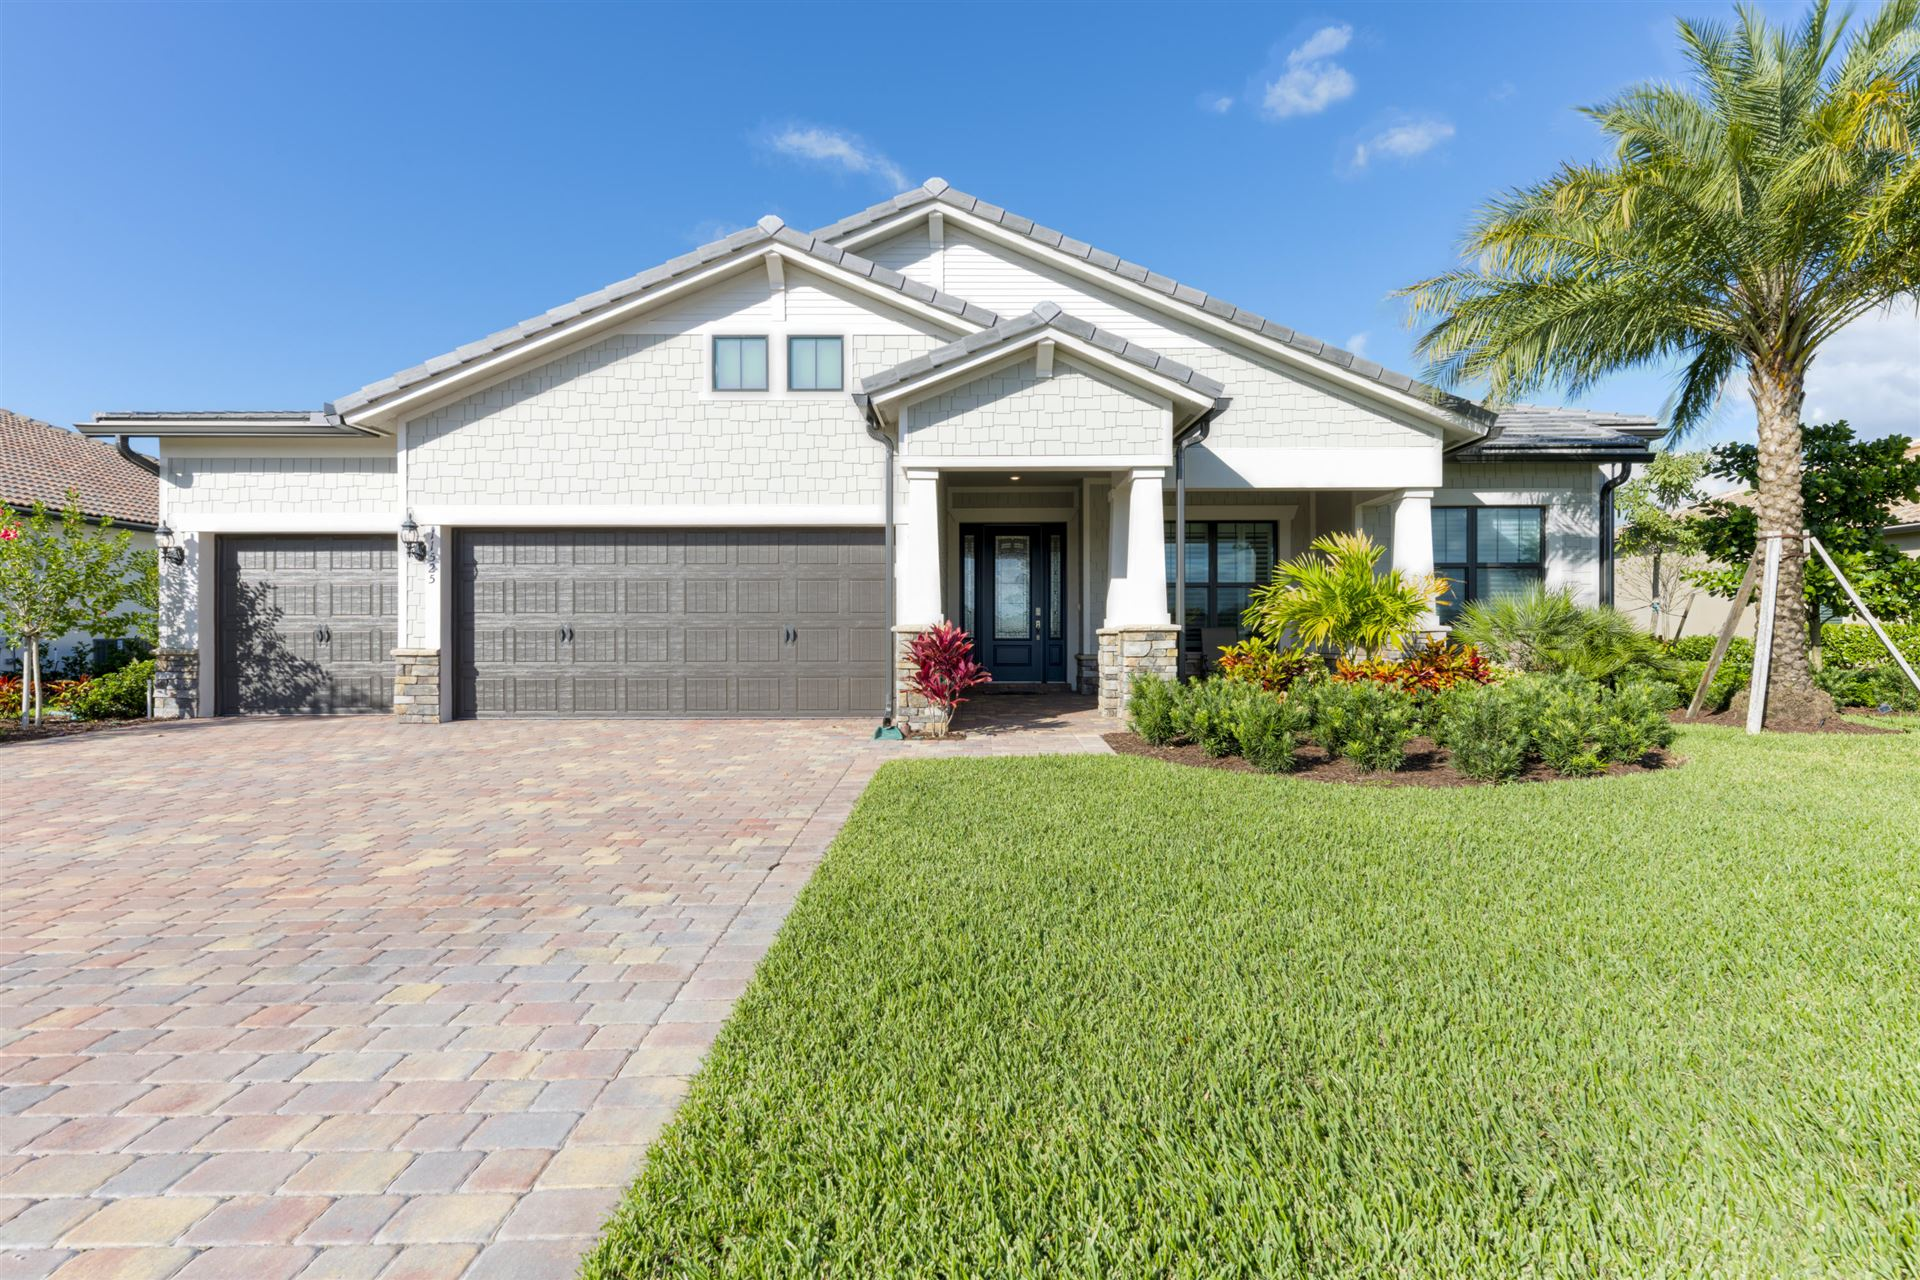 Photo of 11525 Jeannine Street, Palm Beach Gardens, FL 33412 (MLS # RX-10674550)